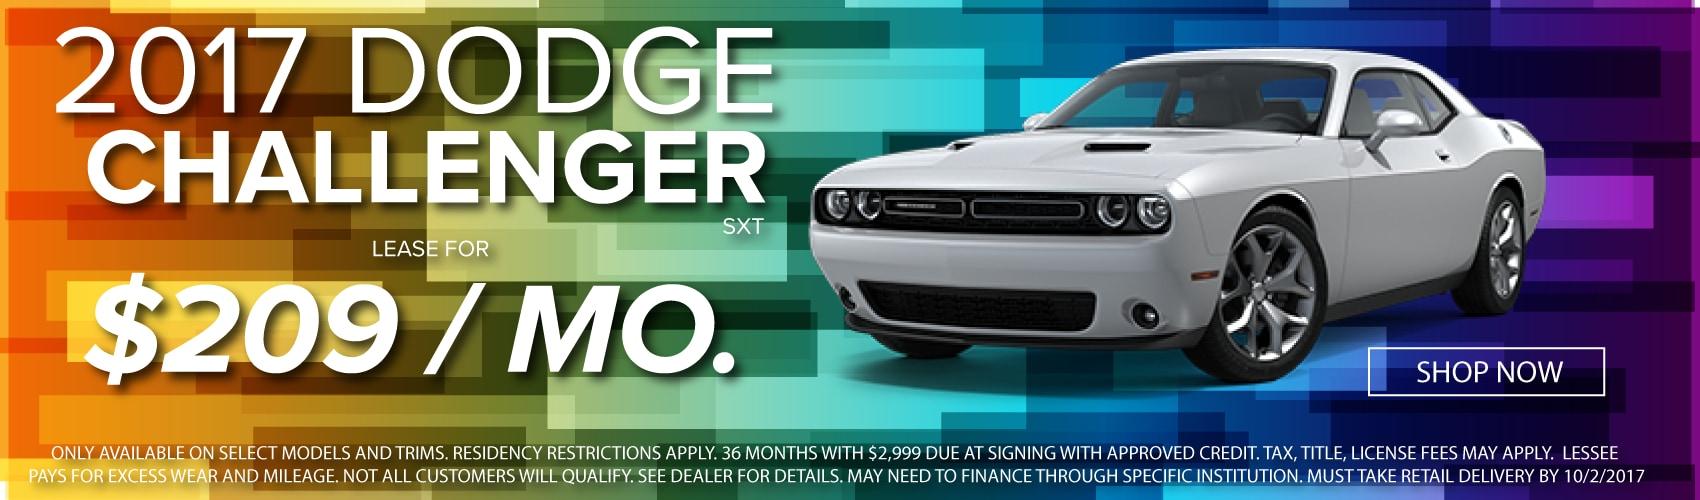 Ny honda dealer new york new amp used car newspaper ad riverhead - Previous Pause Next